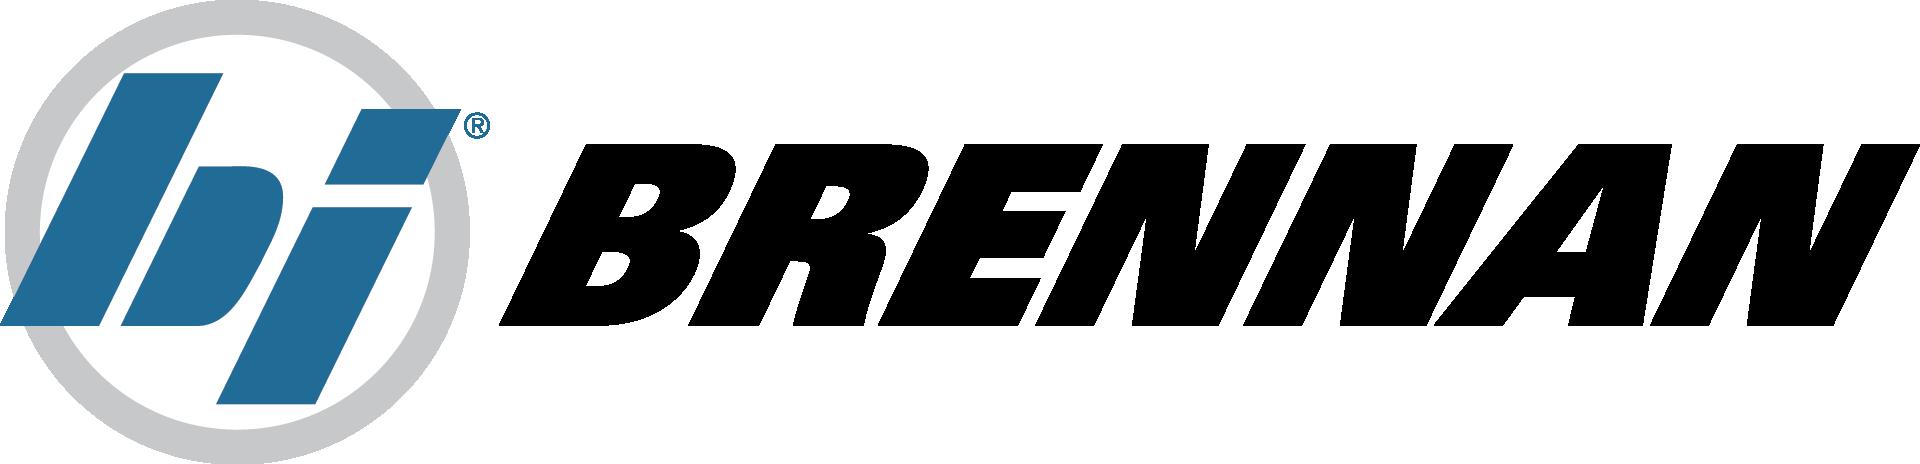 brennan.png